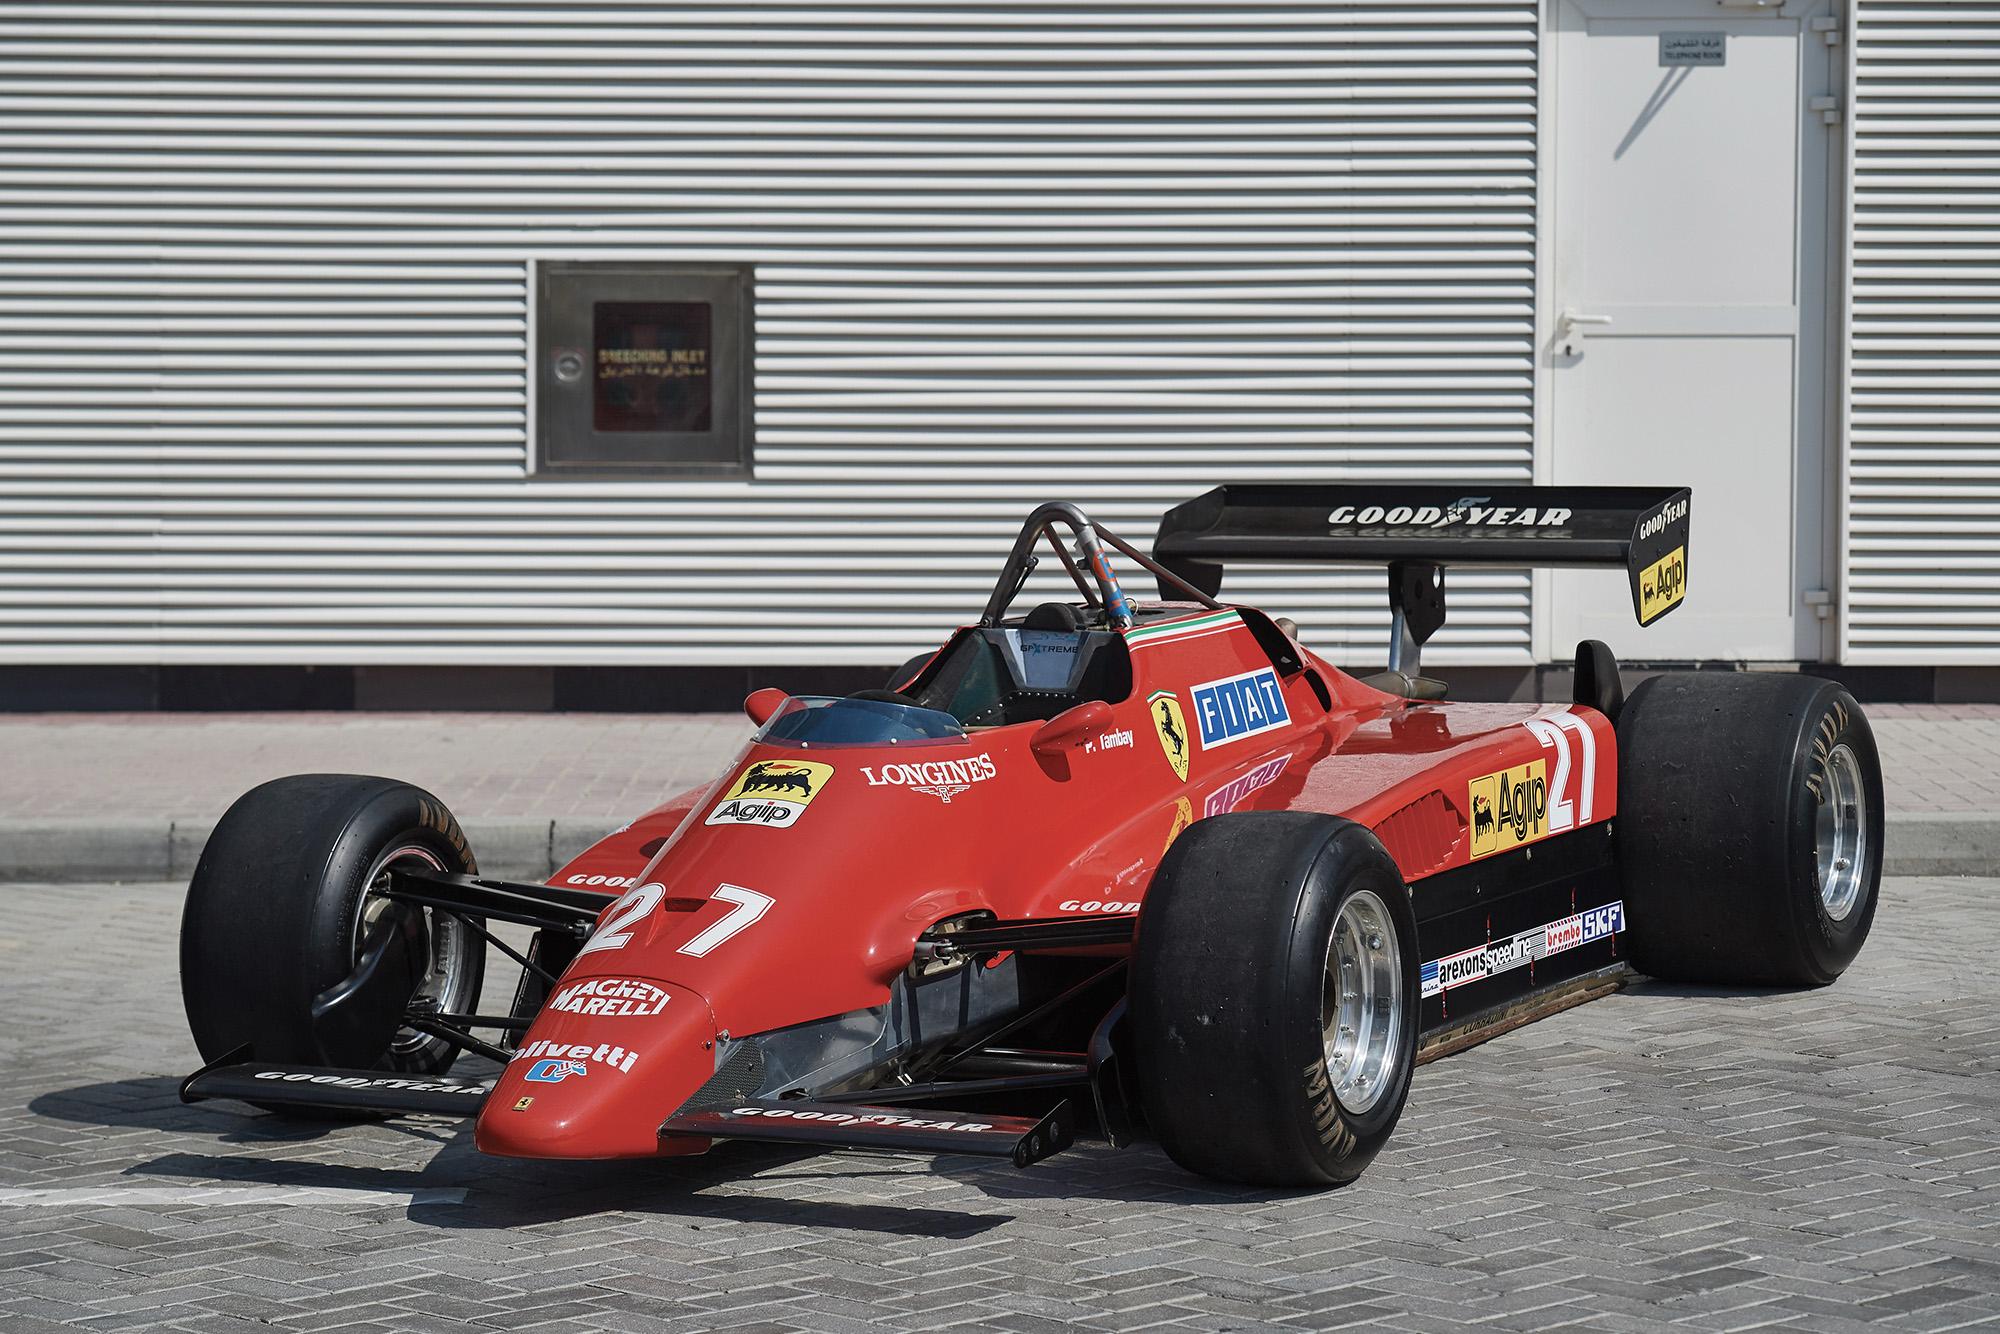 Front view of the 1982 German Grand Prix-winning Ferrari 126 C2